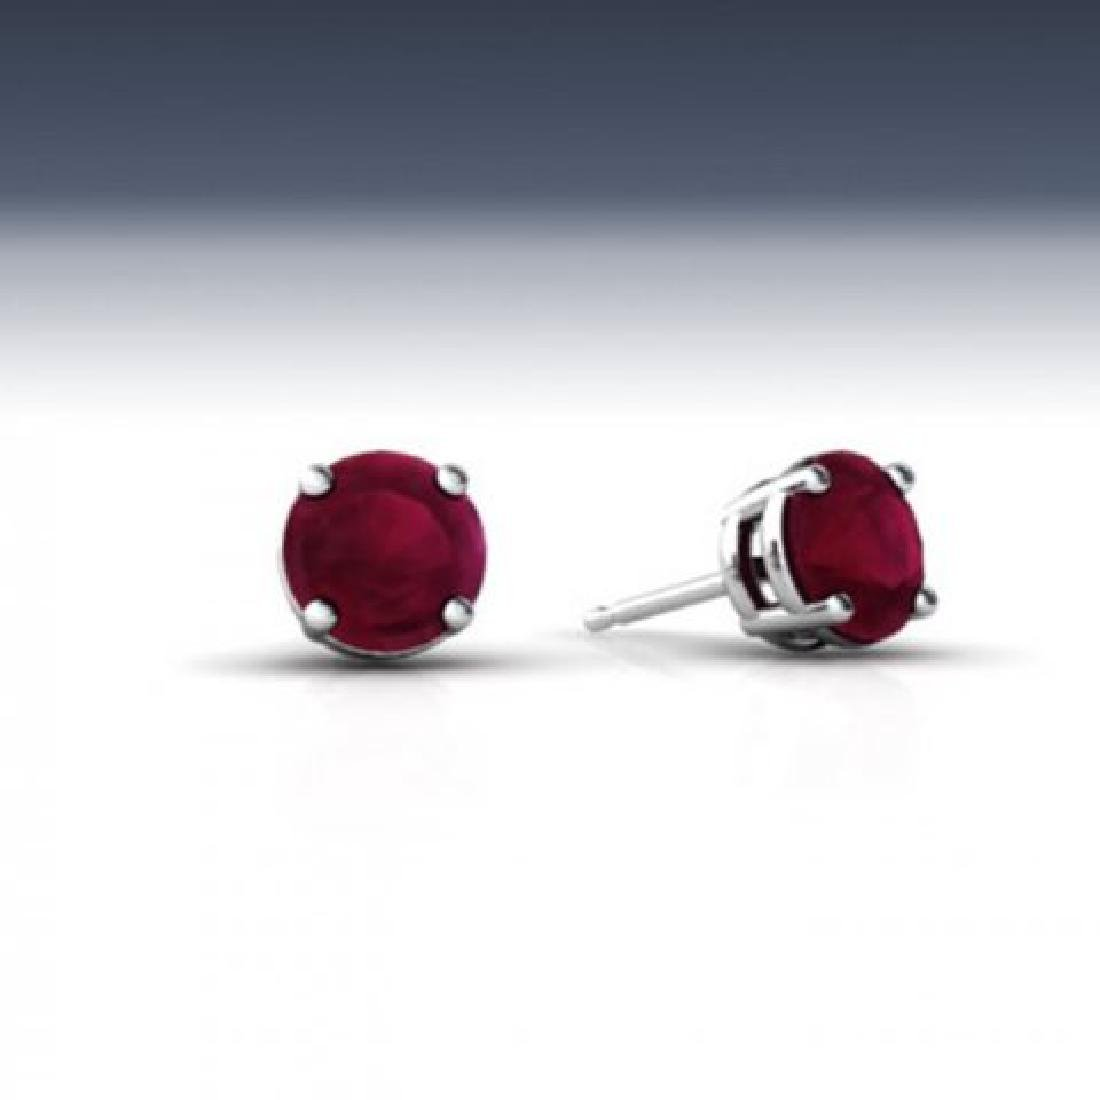 Stud Ruby Earrings 4.35 Carat 14k White Gold